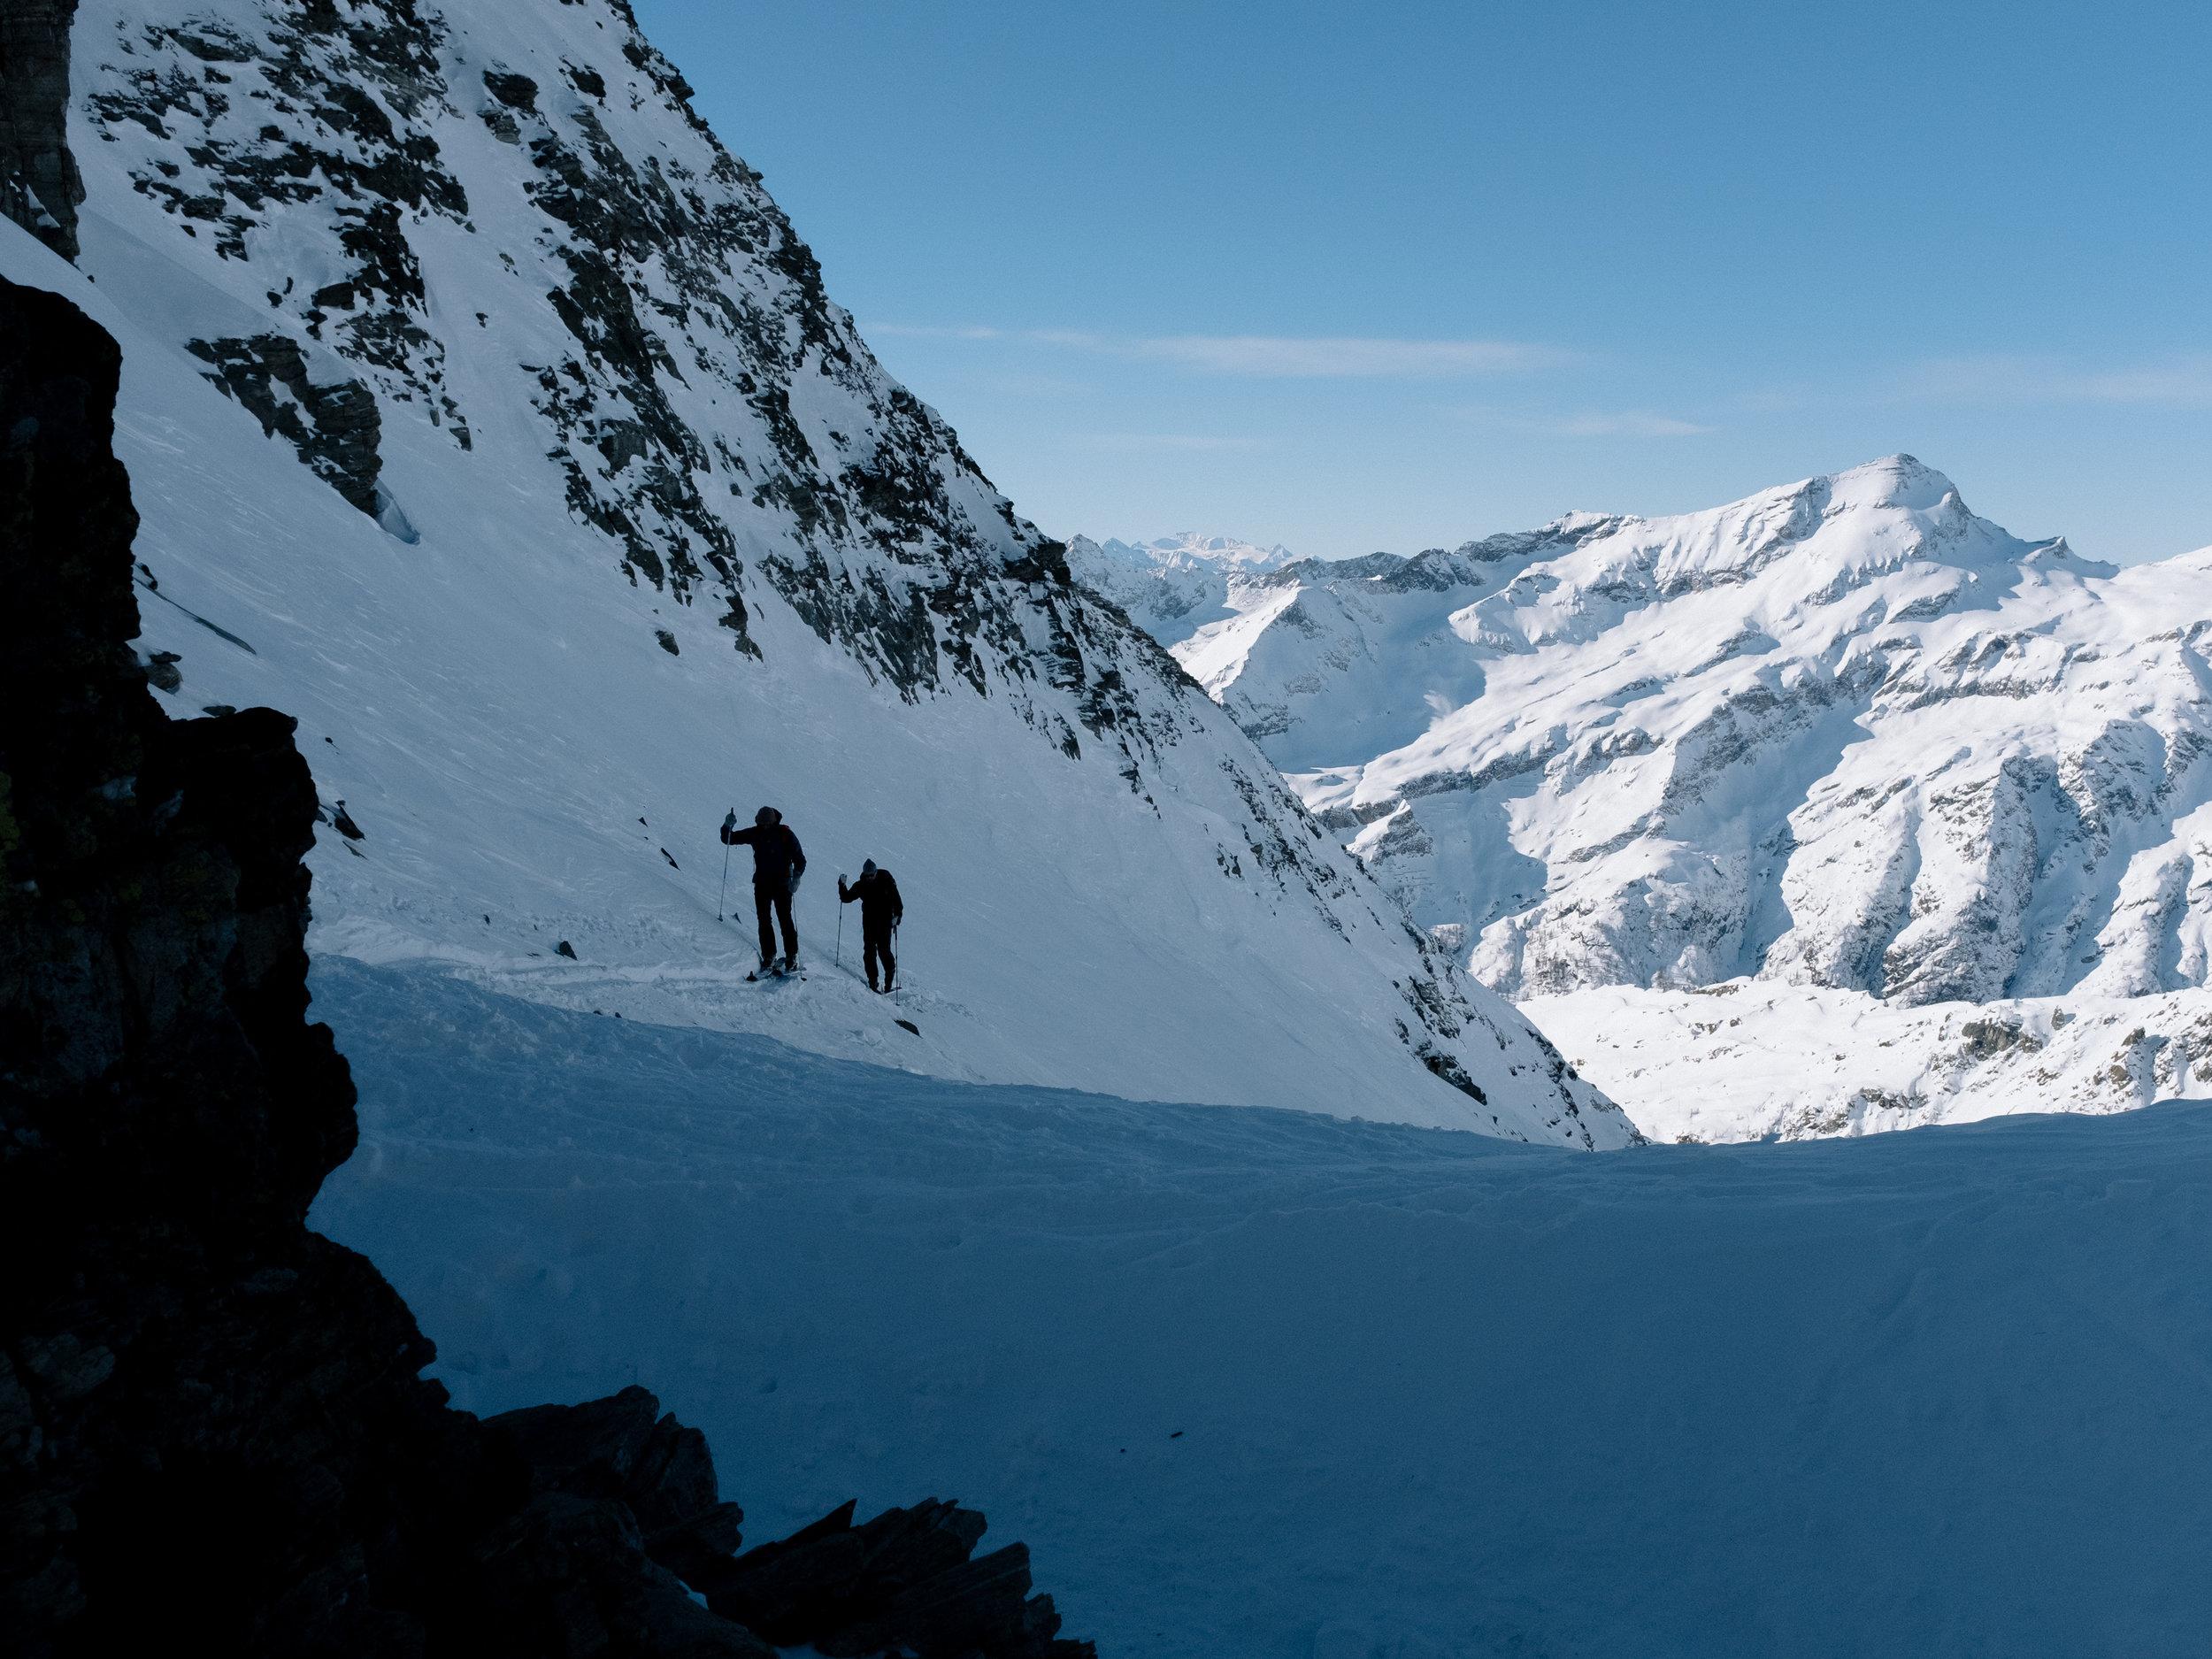 BenReadPhotography_Skiing_Alagna-3.jpg